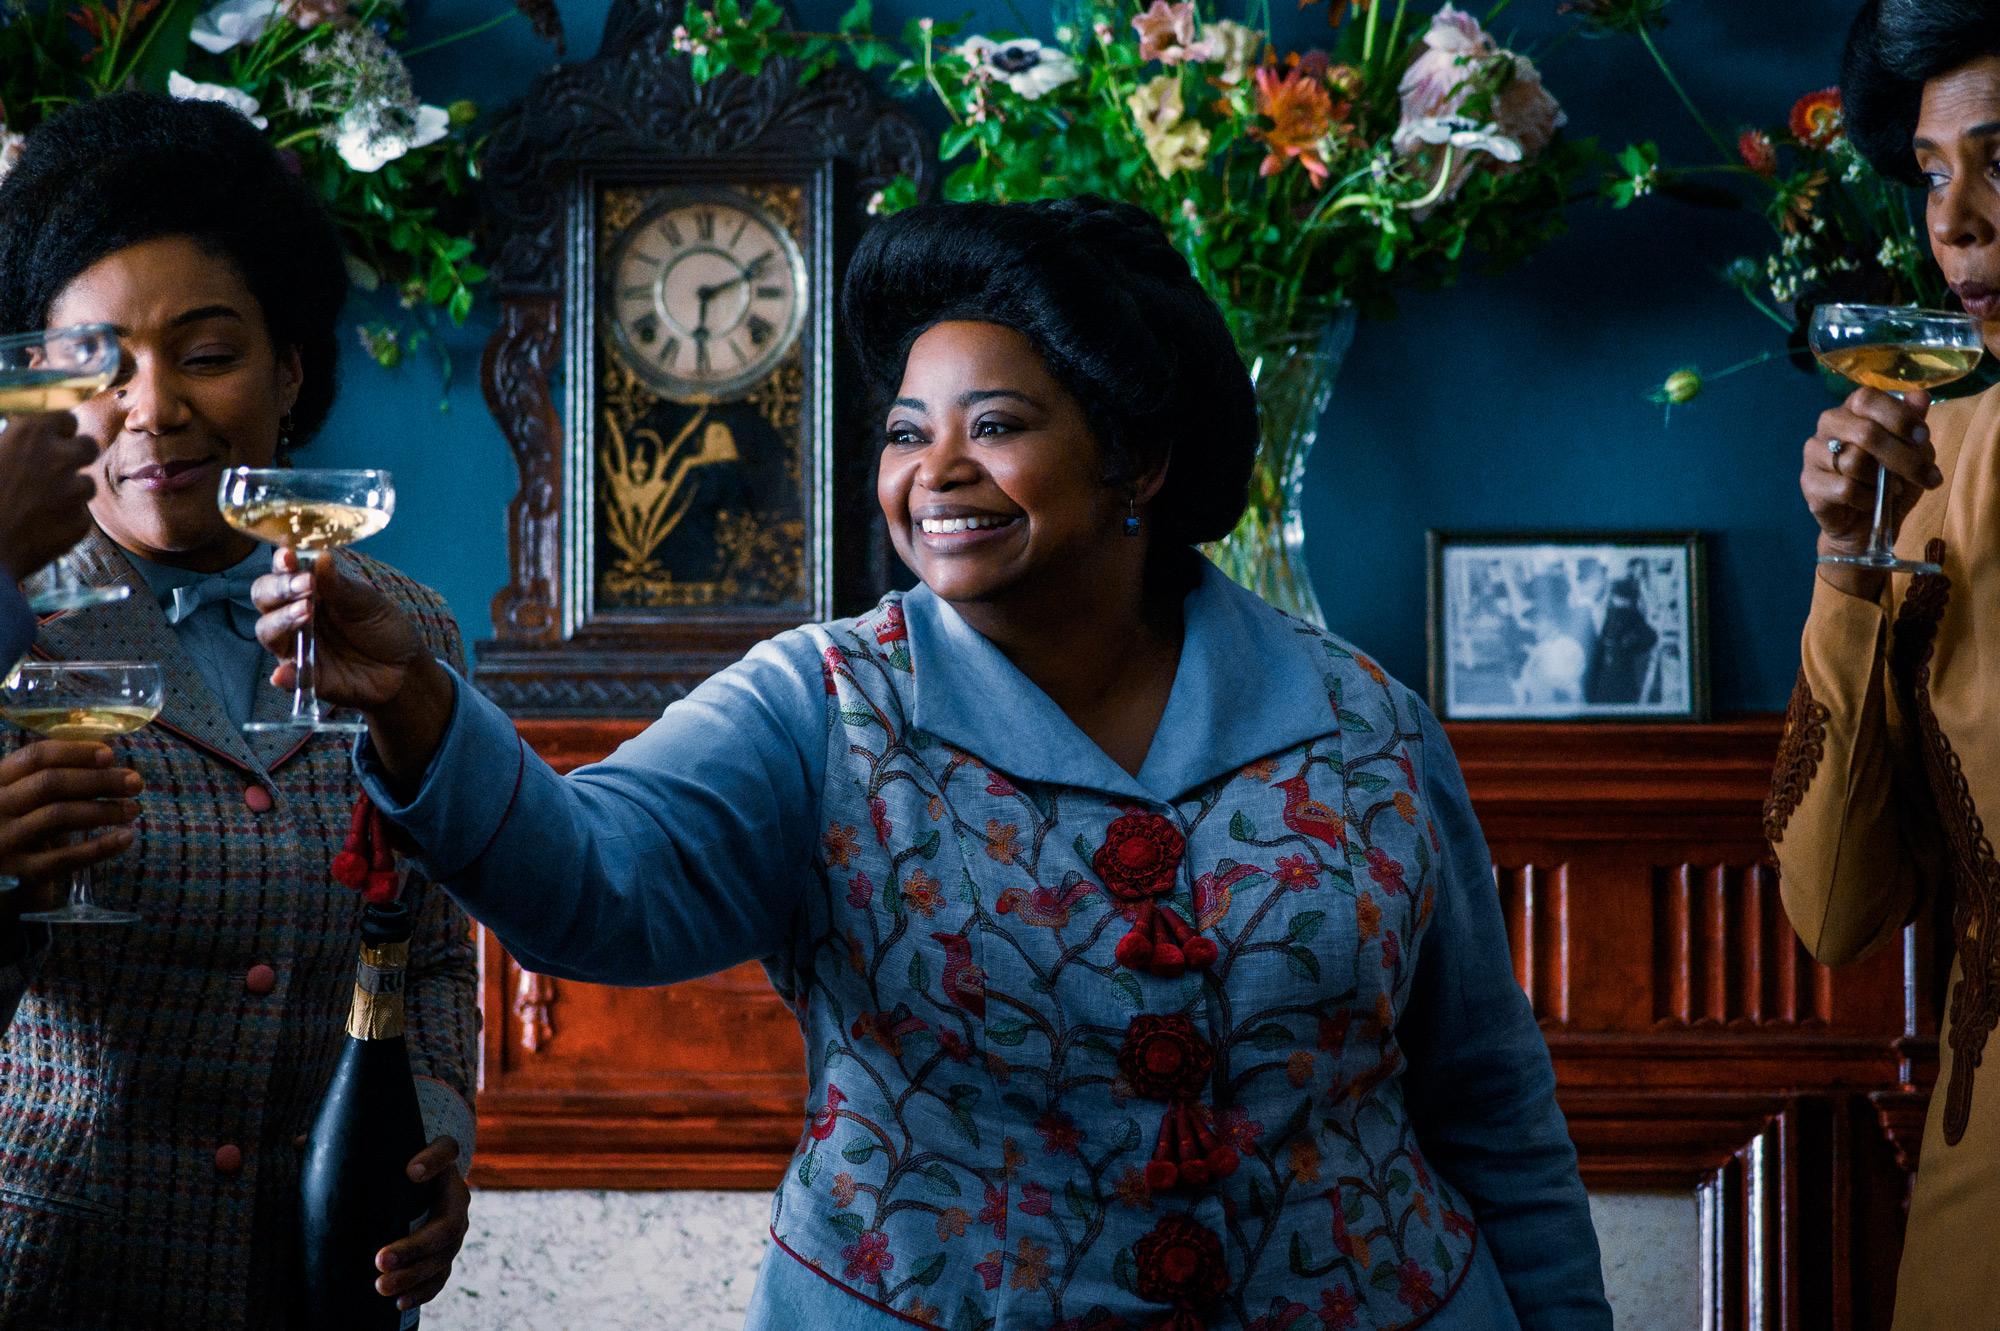 Watch Octavia Spencer Star as Madame C.J. Walker in New Series Trailer